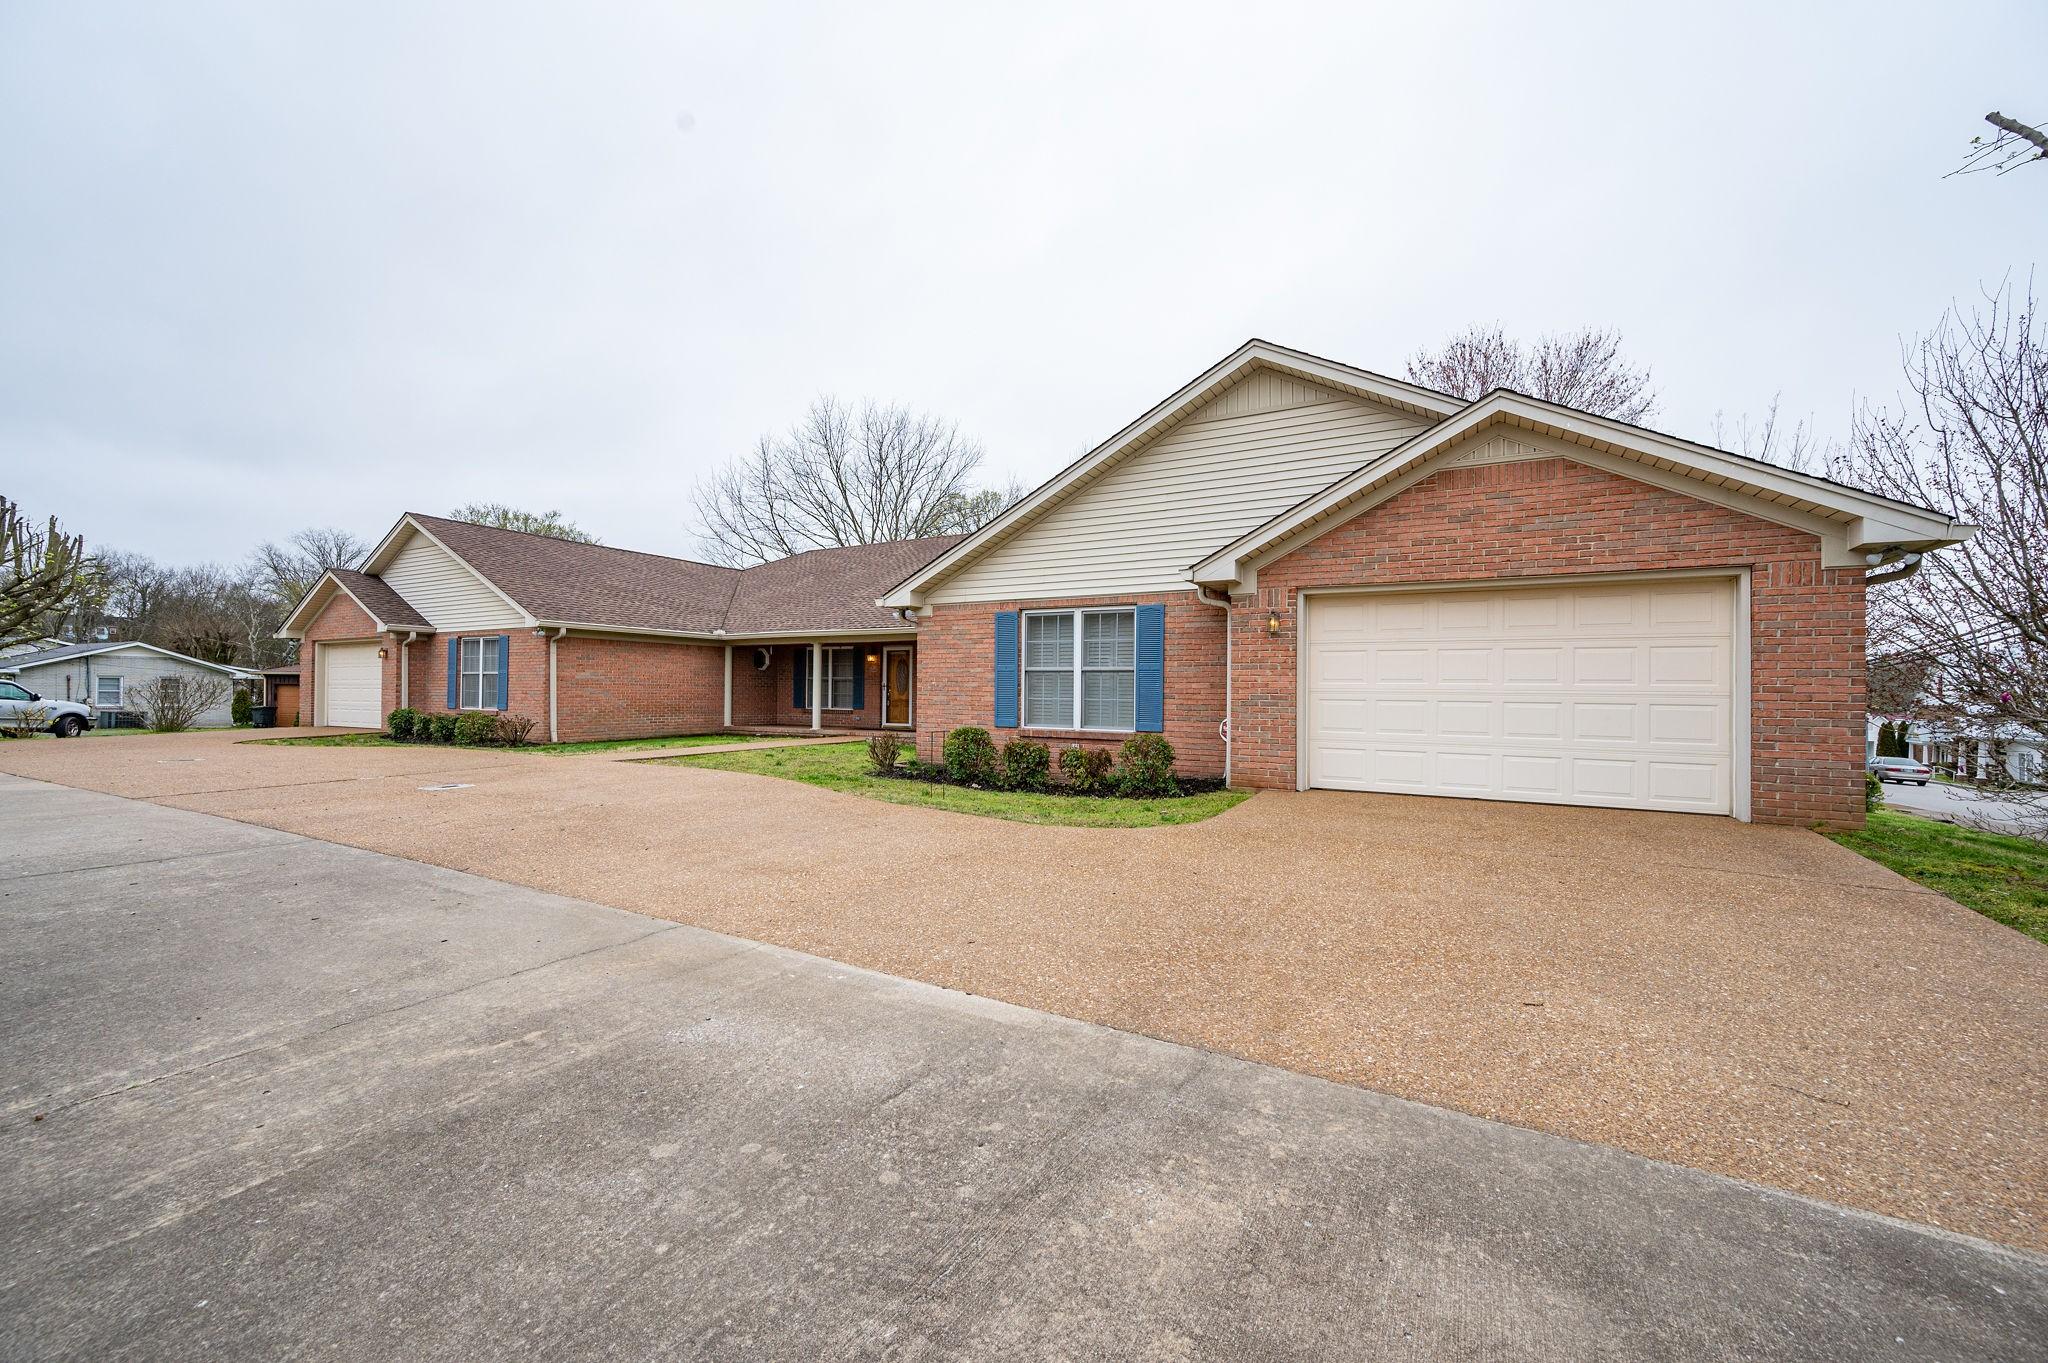 200 S Dillon St, Woodbury, TN 37190 - Woodbury, TN real estate listing